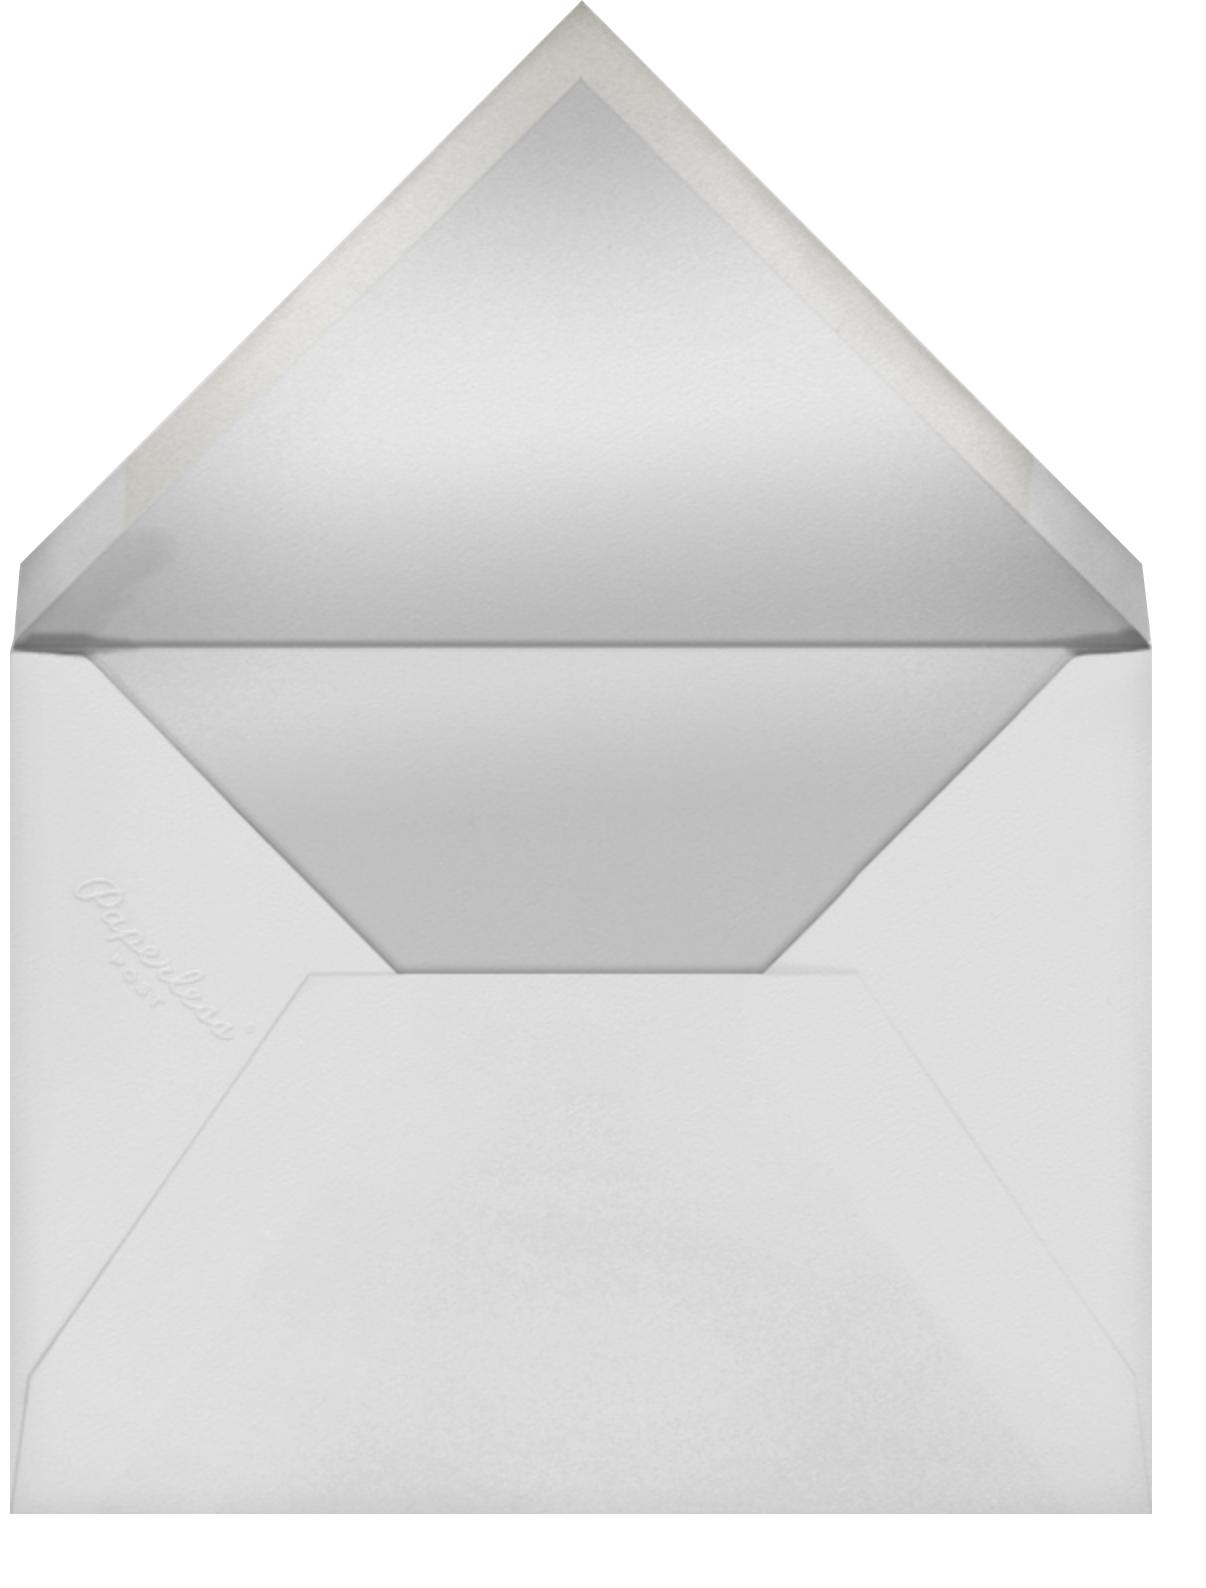 Placard (Program) - Silver - Paperless Post - Menus and programs - envelope back